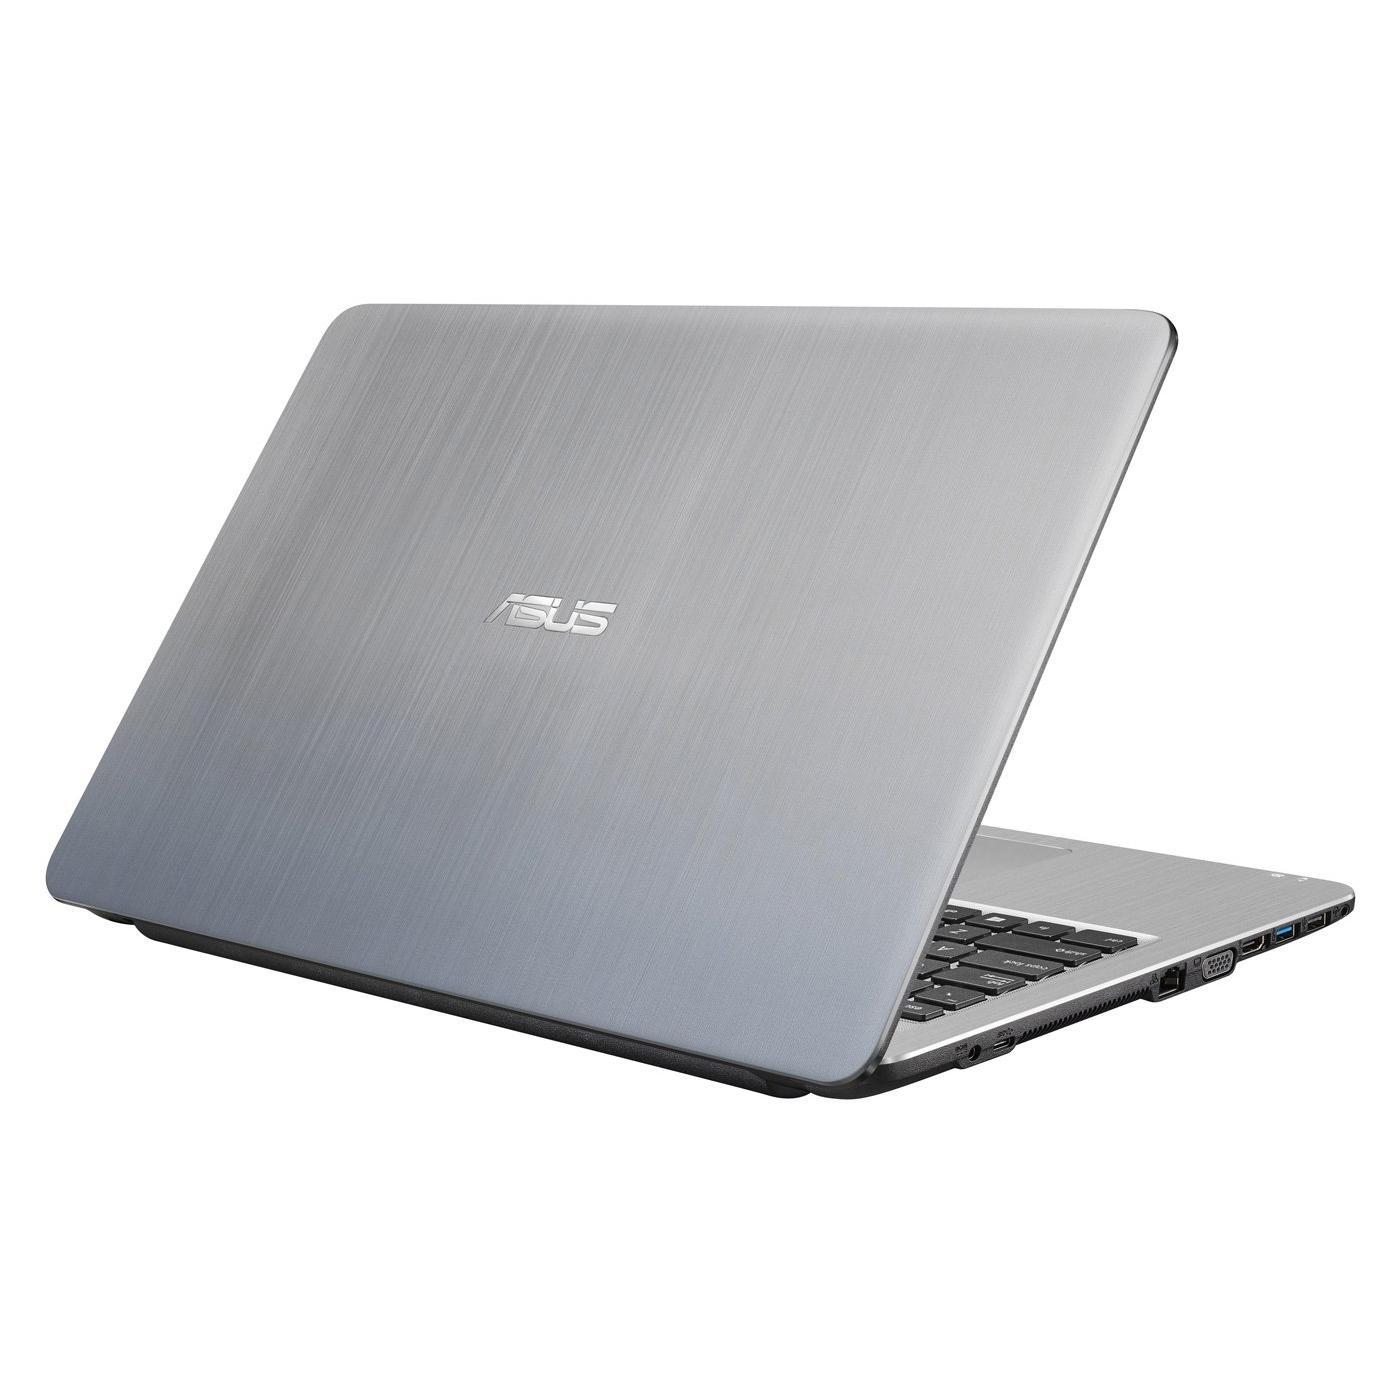 "Asus R540LJ-GK535T 15"" Core i3 2 GHz  - HDD 1 TB - 4GB Tastiera Francese"